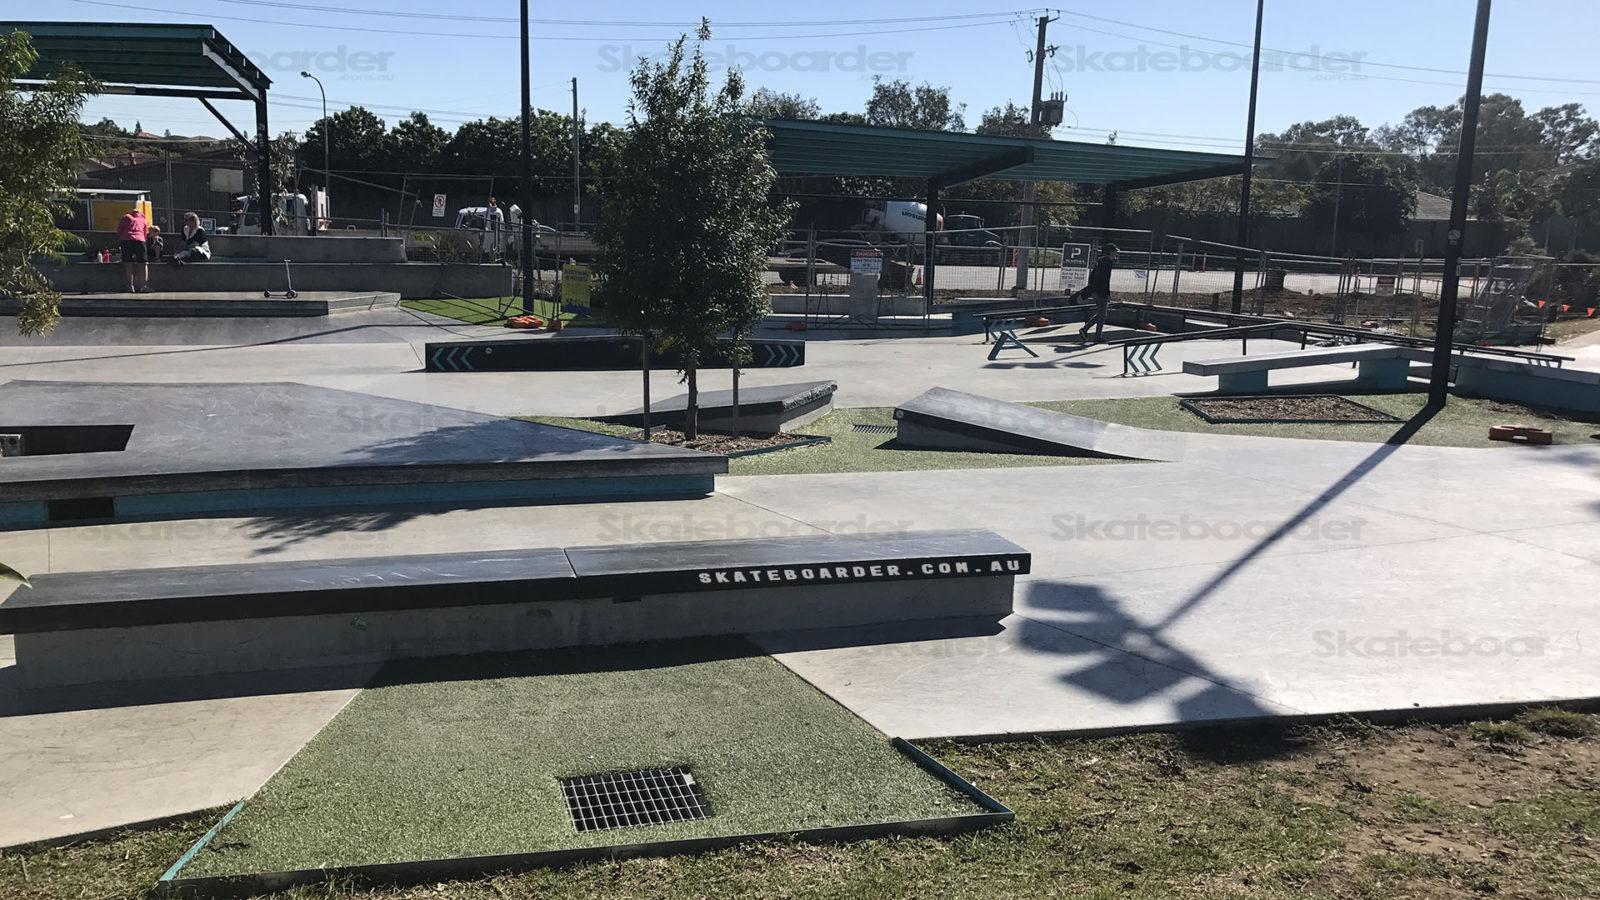 Rails and ledges at Bracken Ridge Skate Plaza